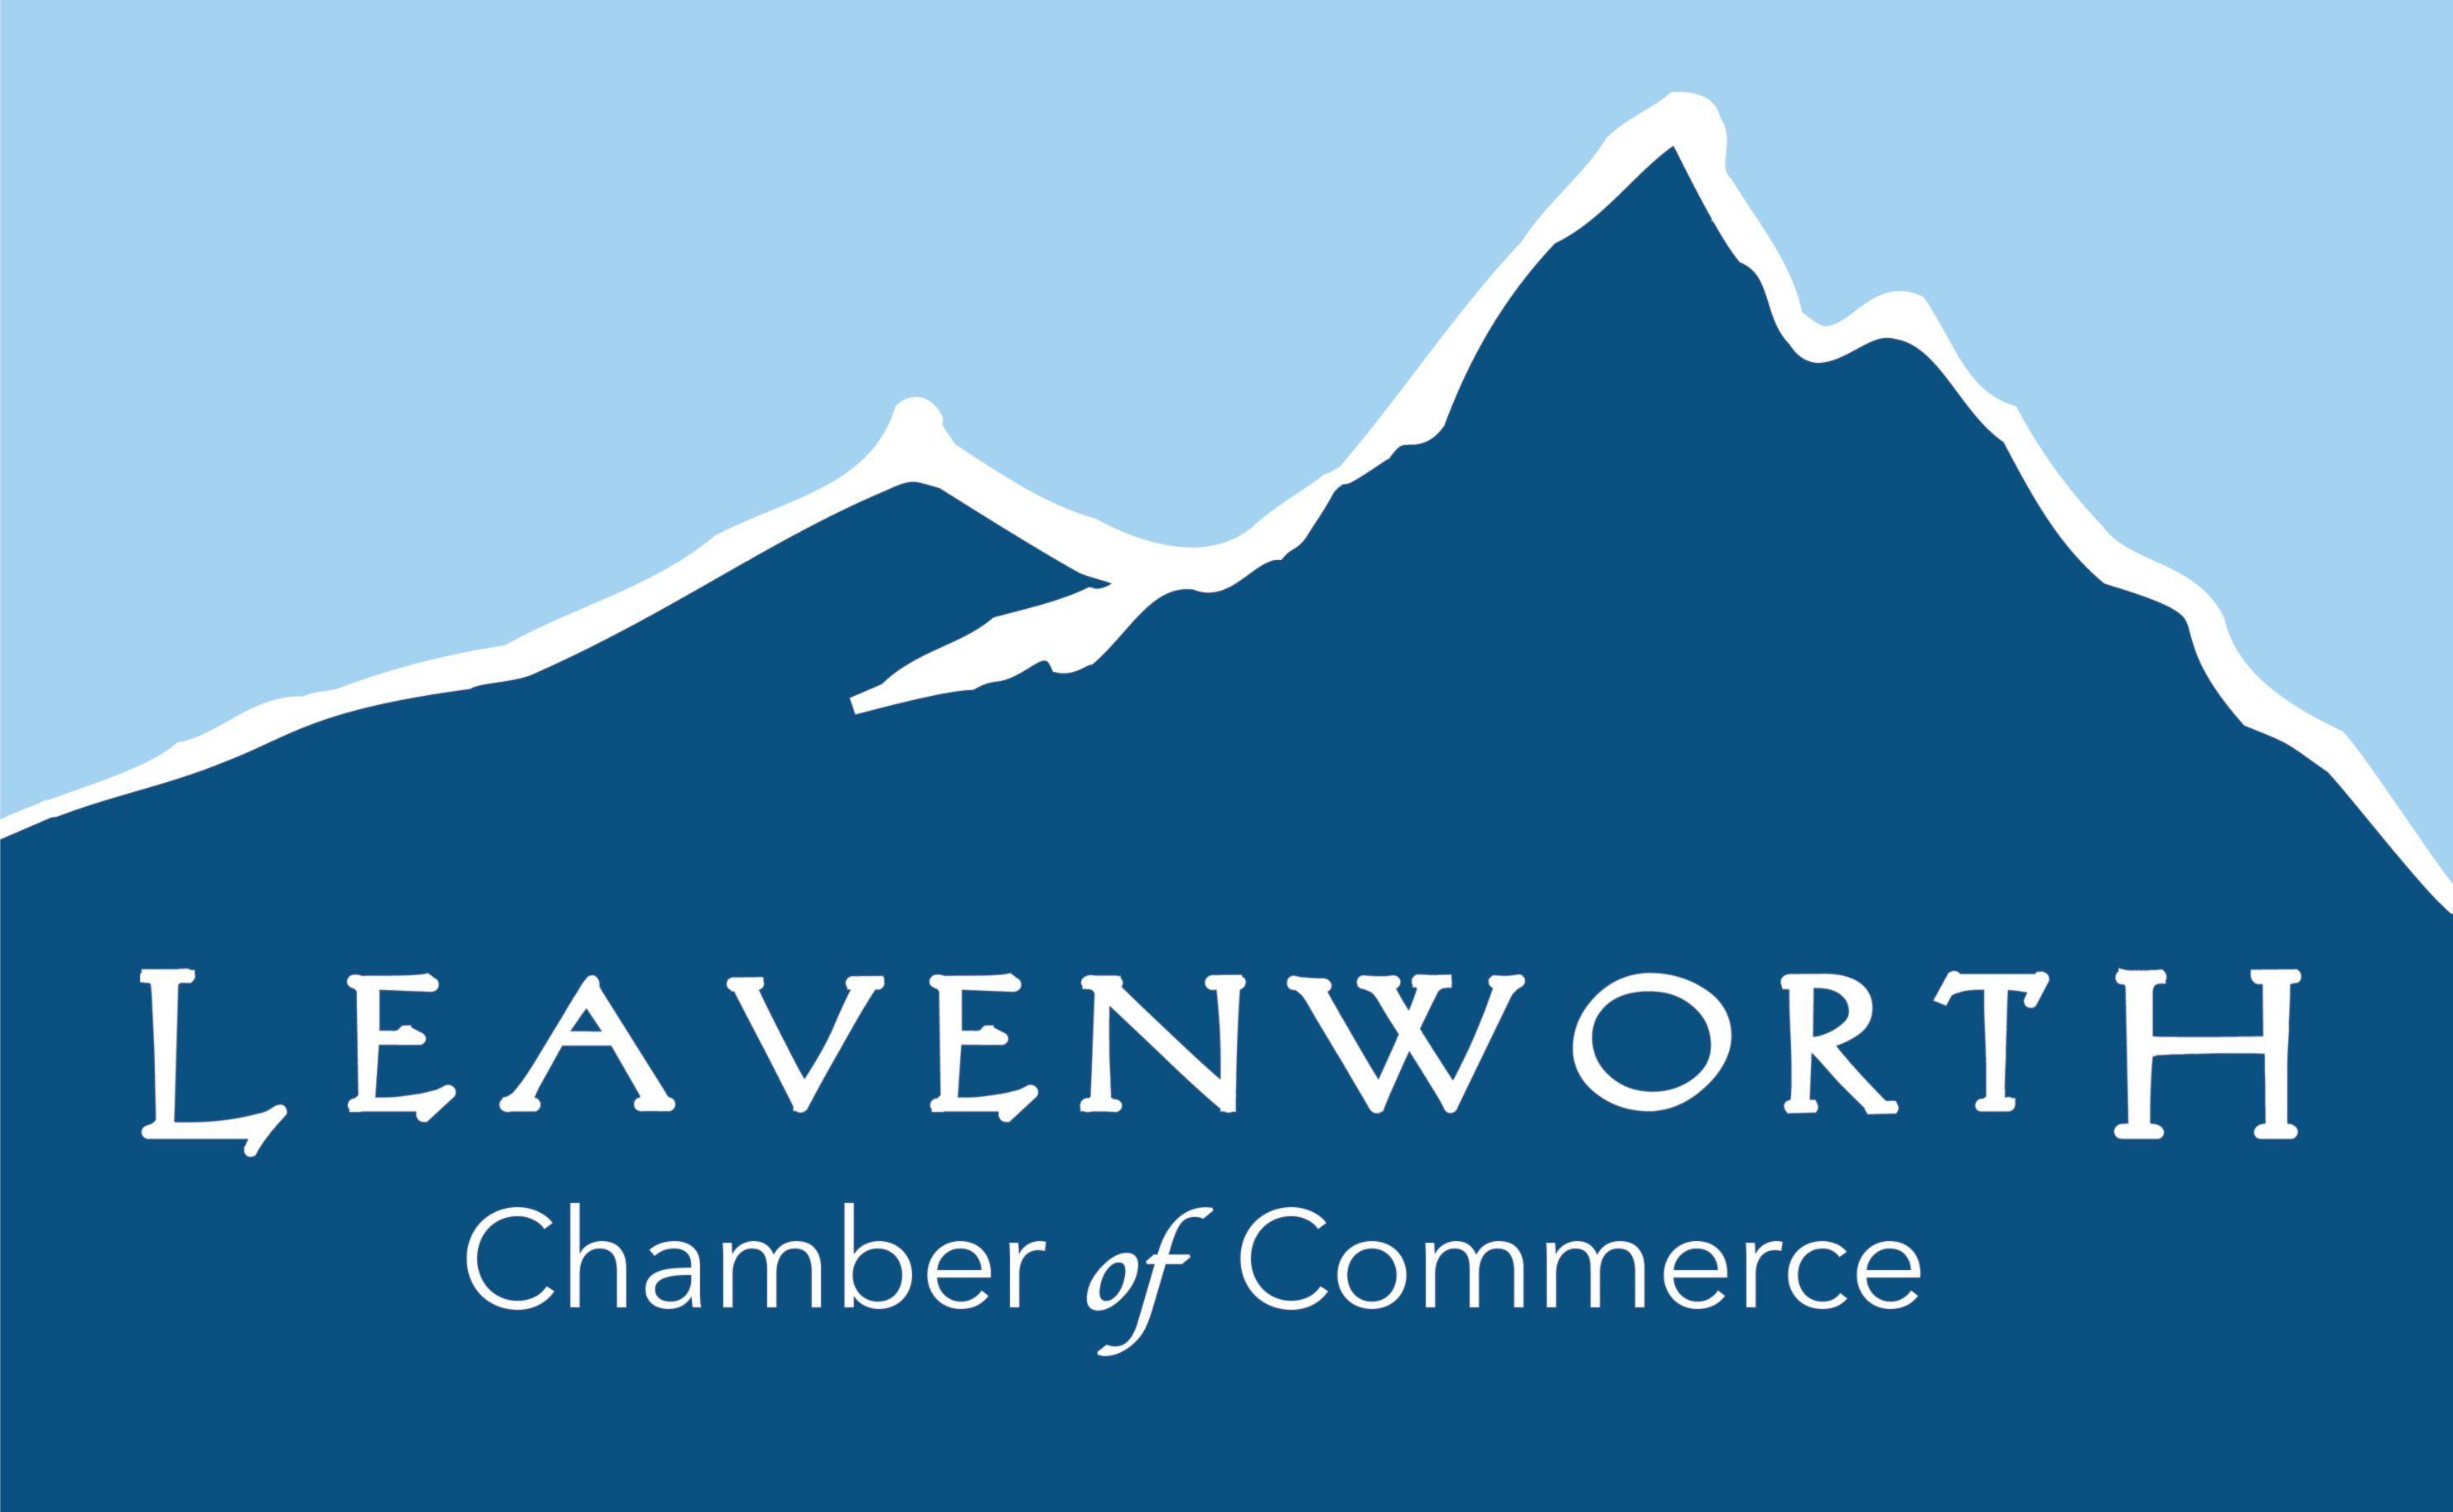 Leavenworth Chamber of Commerce